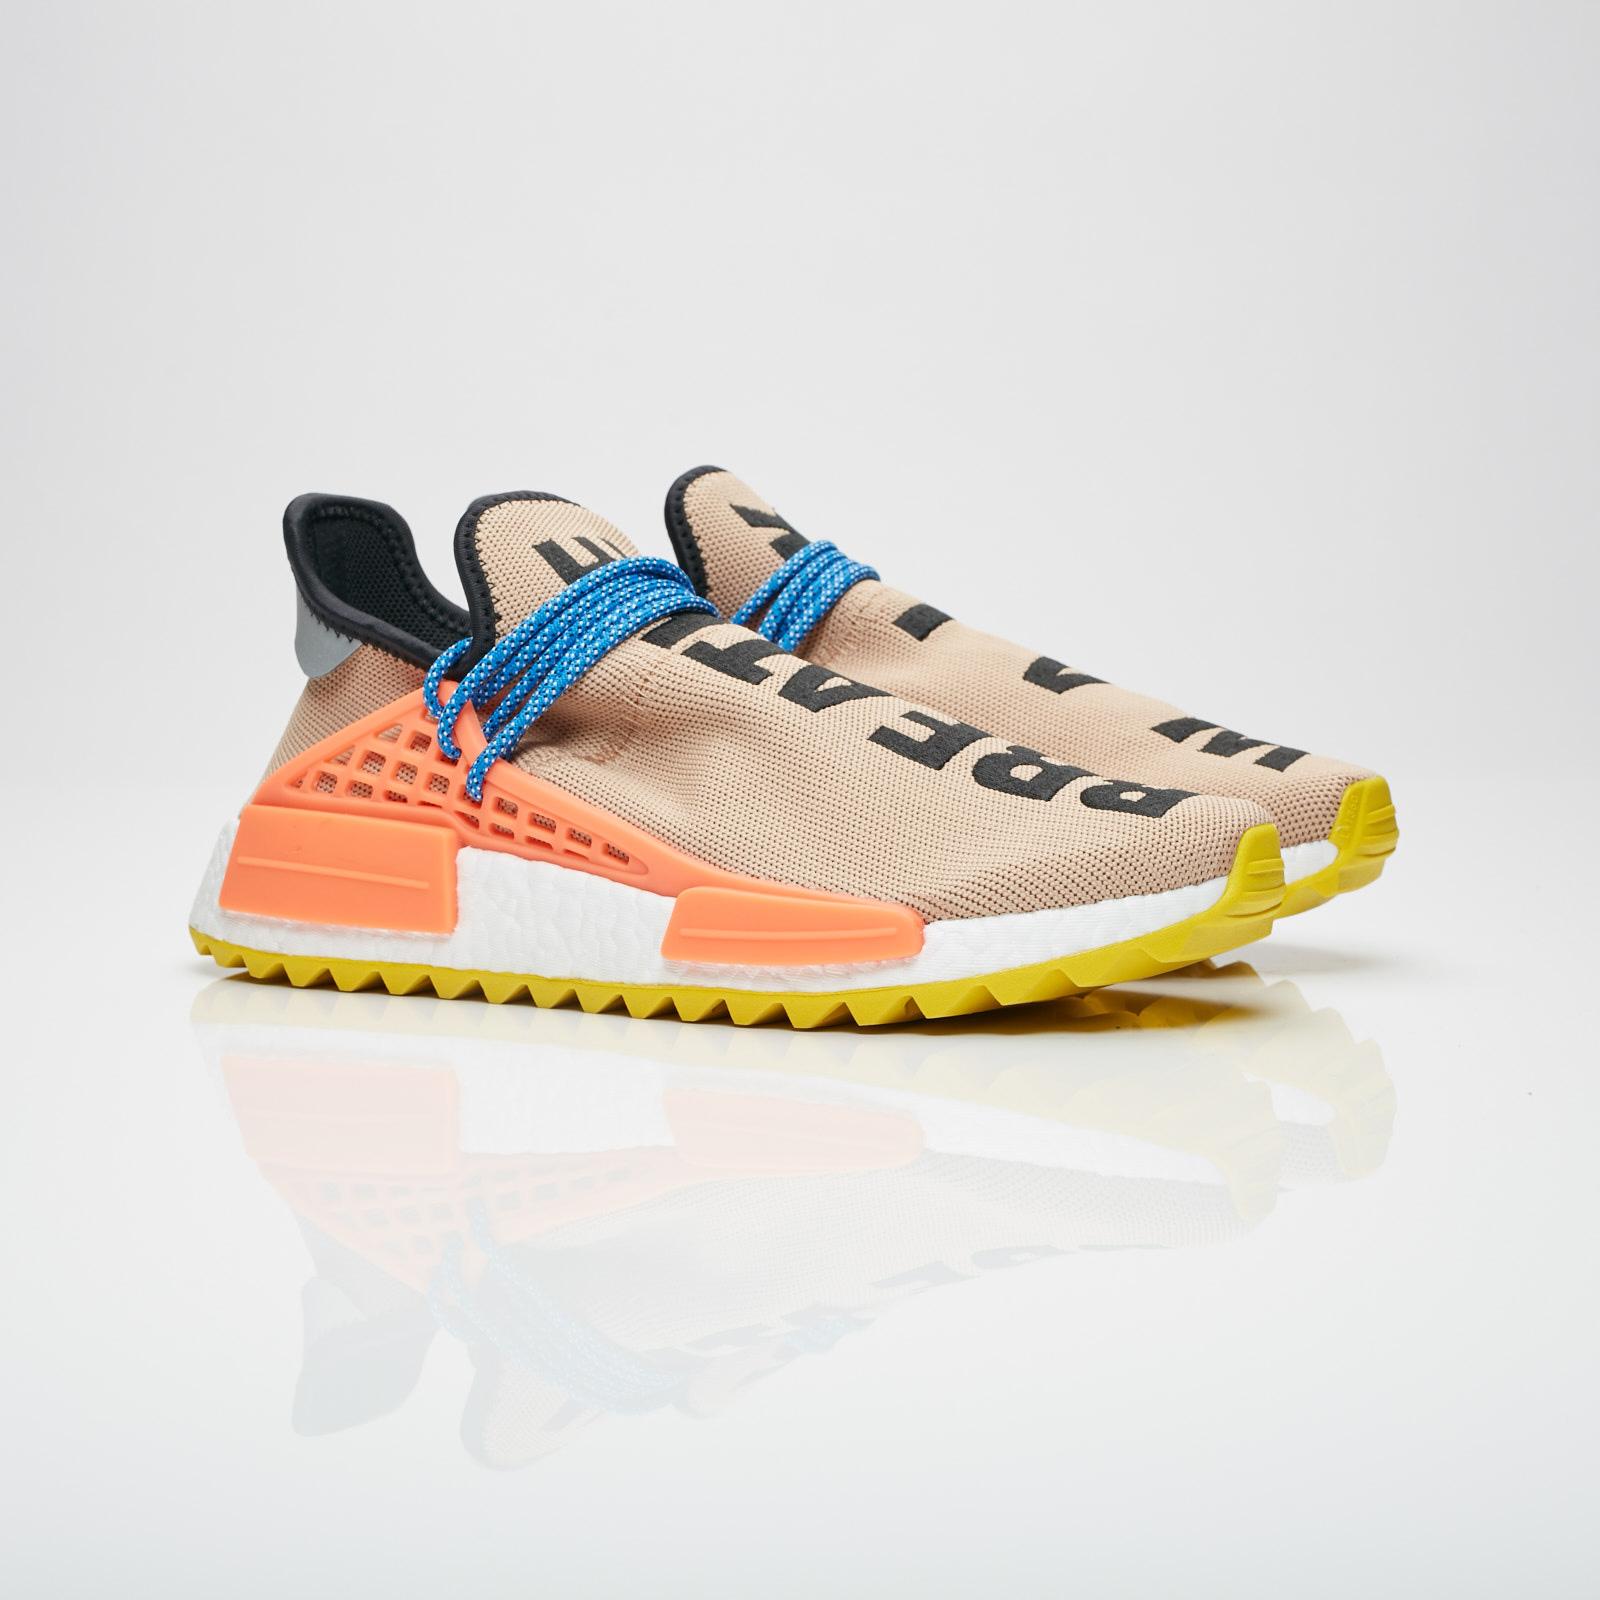 d4dc8430f739 adidas PW Human Race NMD T - Ac7361 - Sneakersnstuff